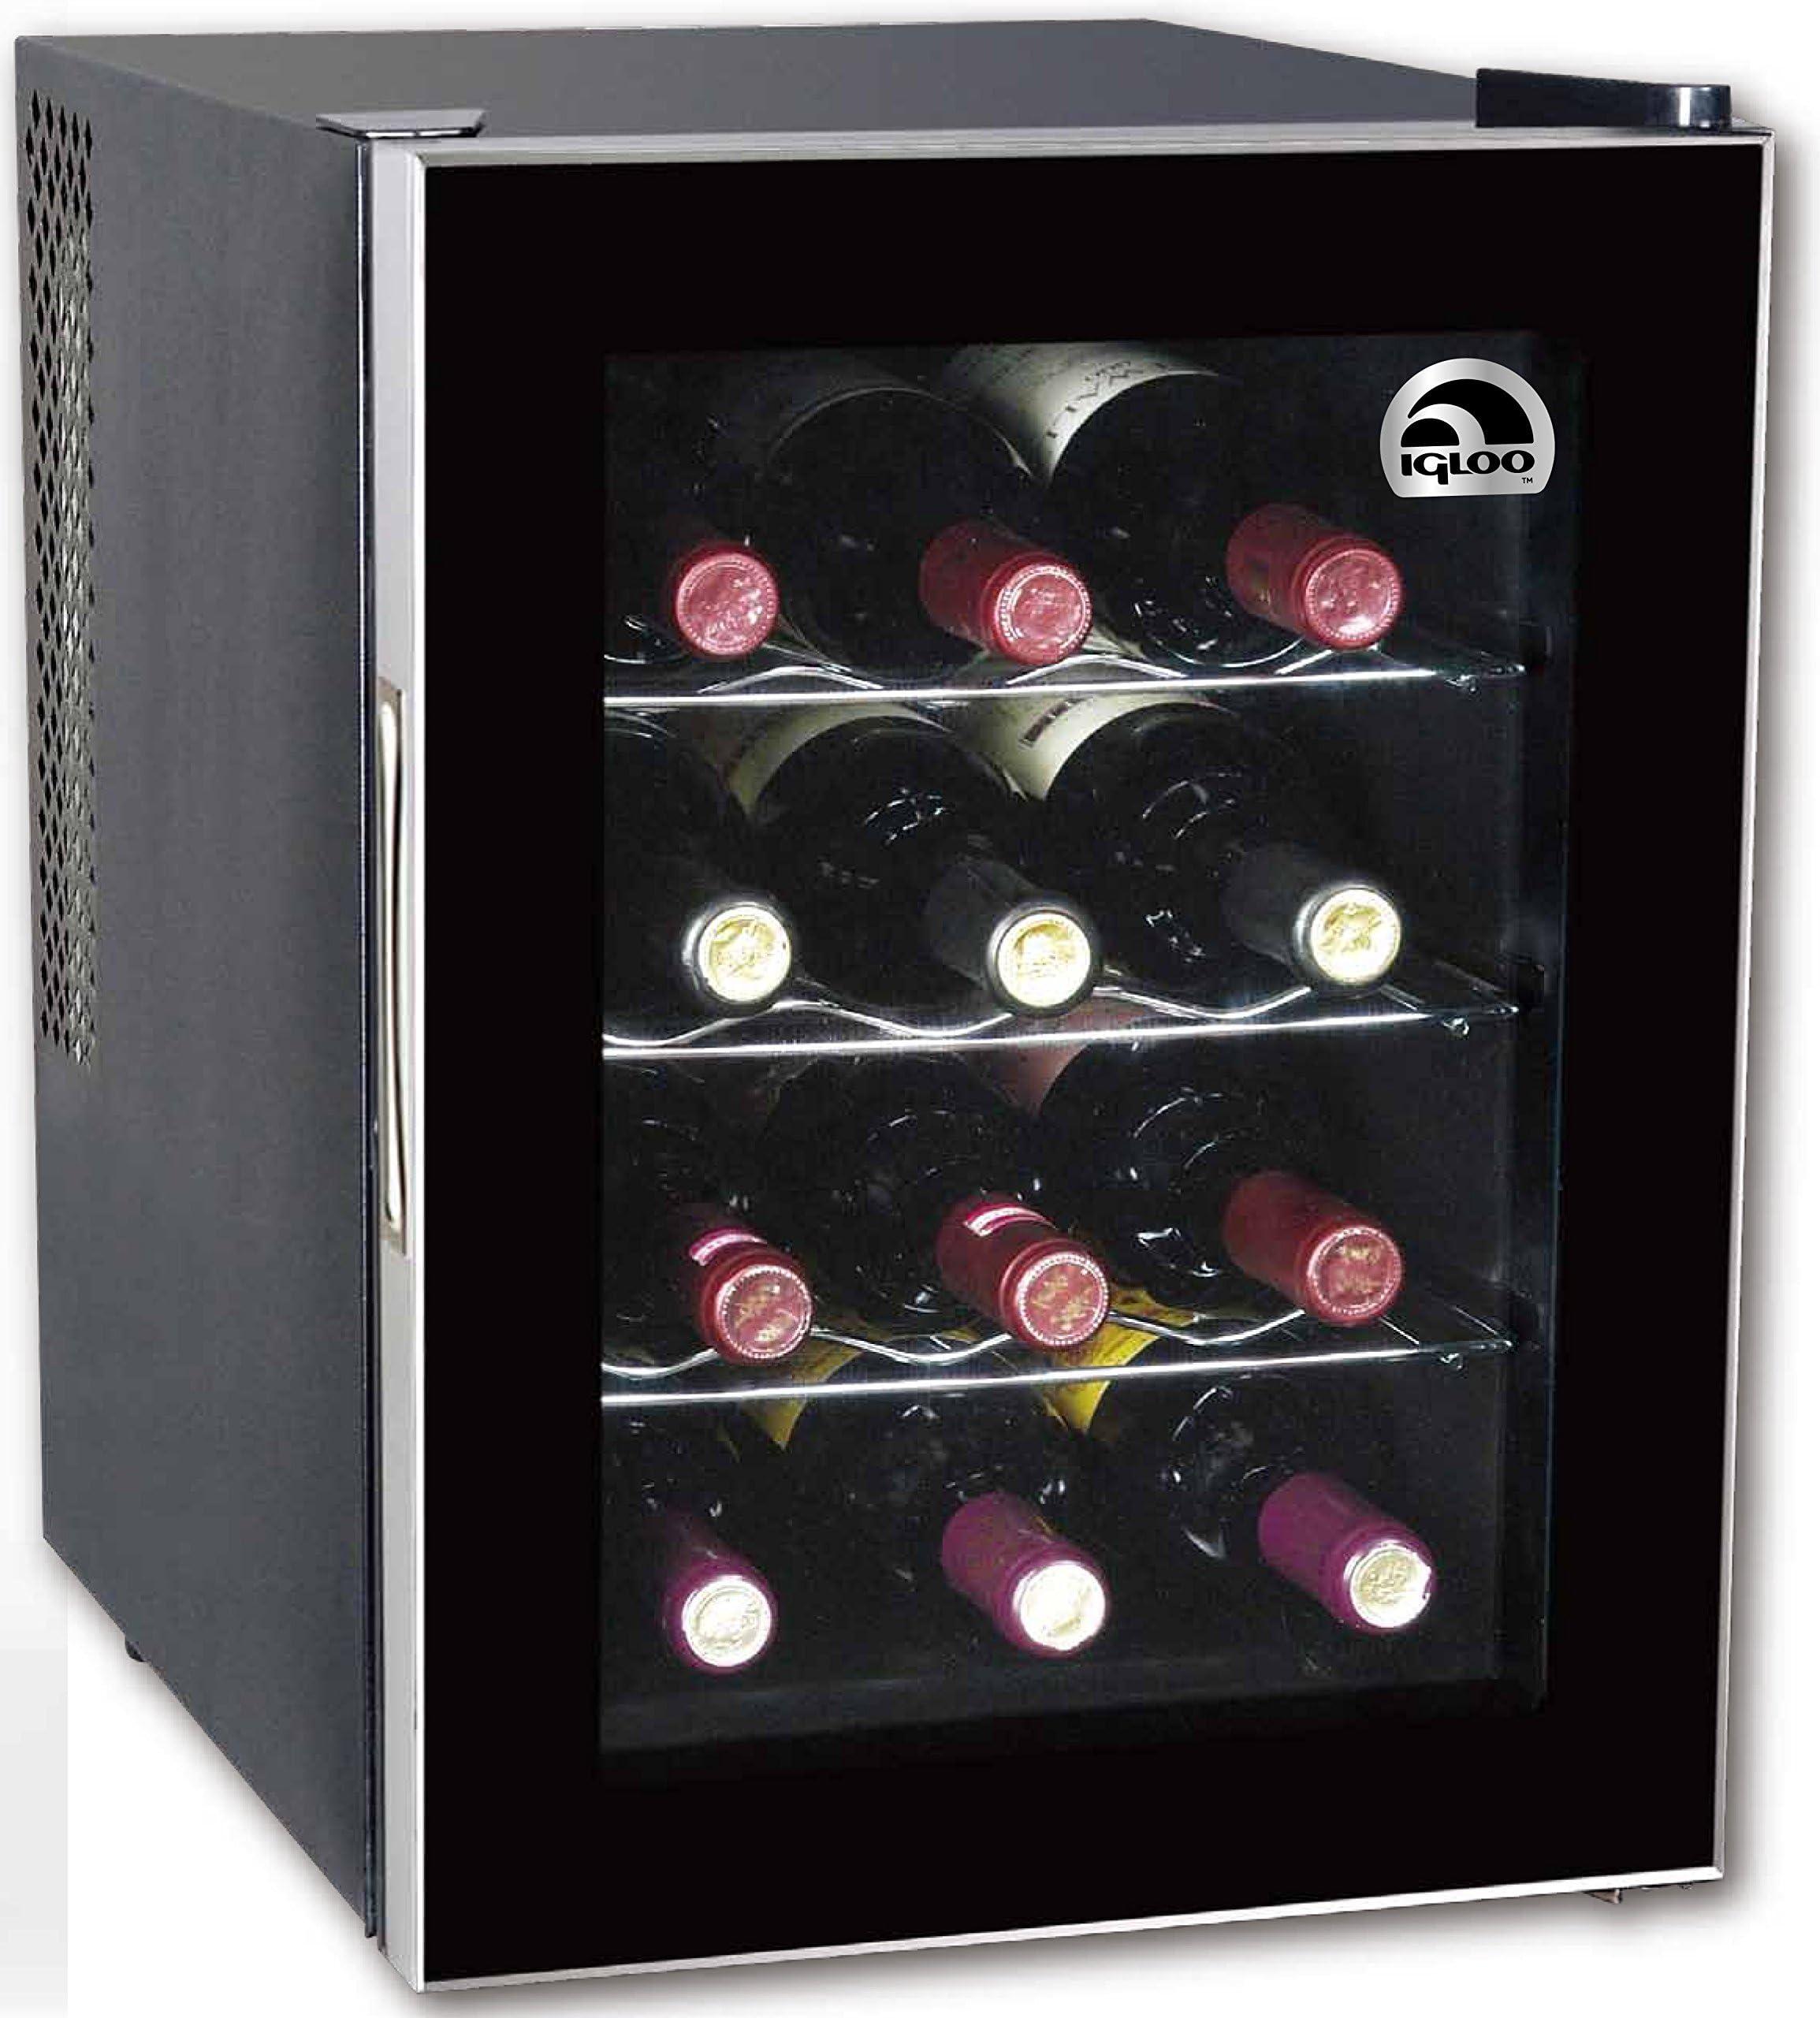 12 Bottle Wine Fridge  sc 1 st  Amazon.com & Small Wine Cellars   Amazon.com